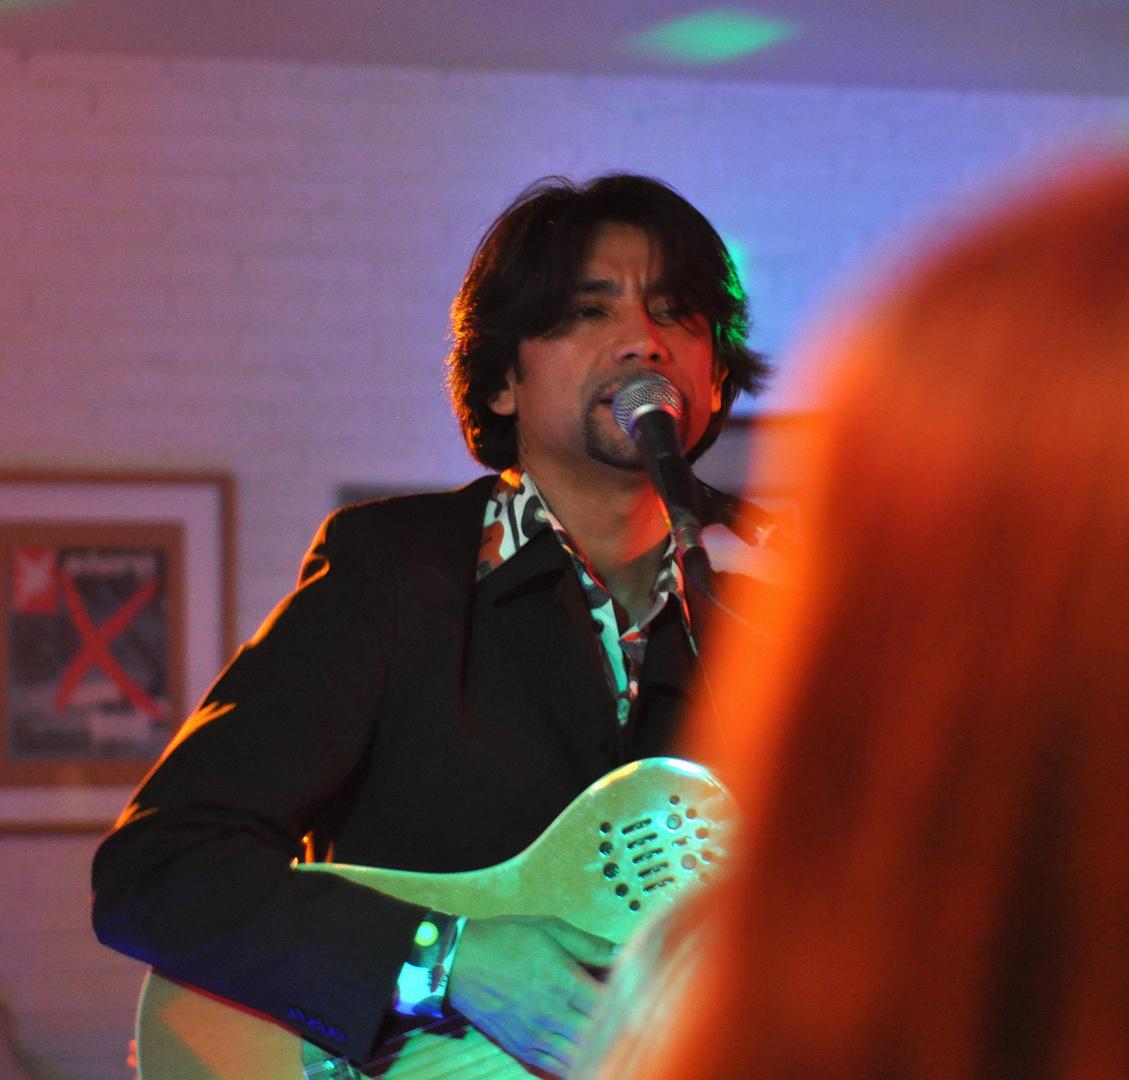 La Guitarra y la Pelirroja